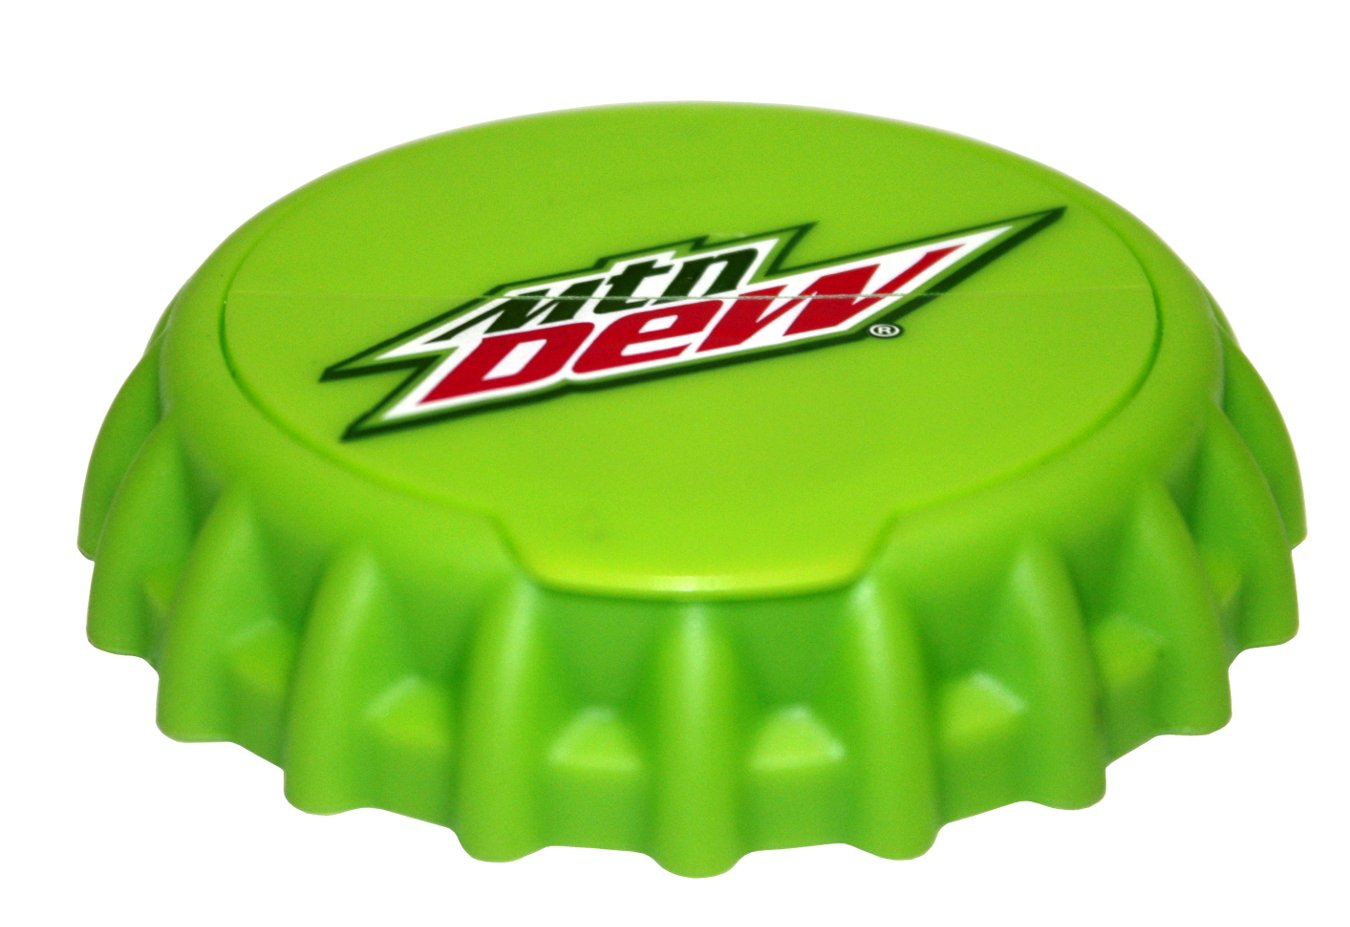 Jokari Mtn Dew Modern Logo Snap and Sip Can Cap, Green 18311P1